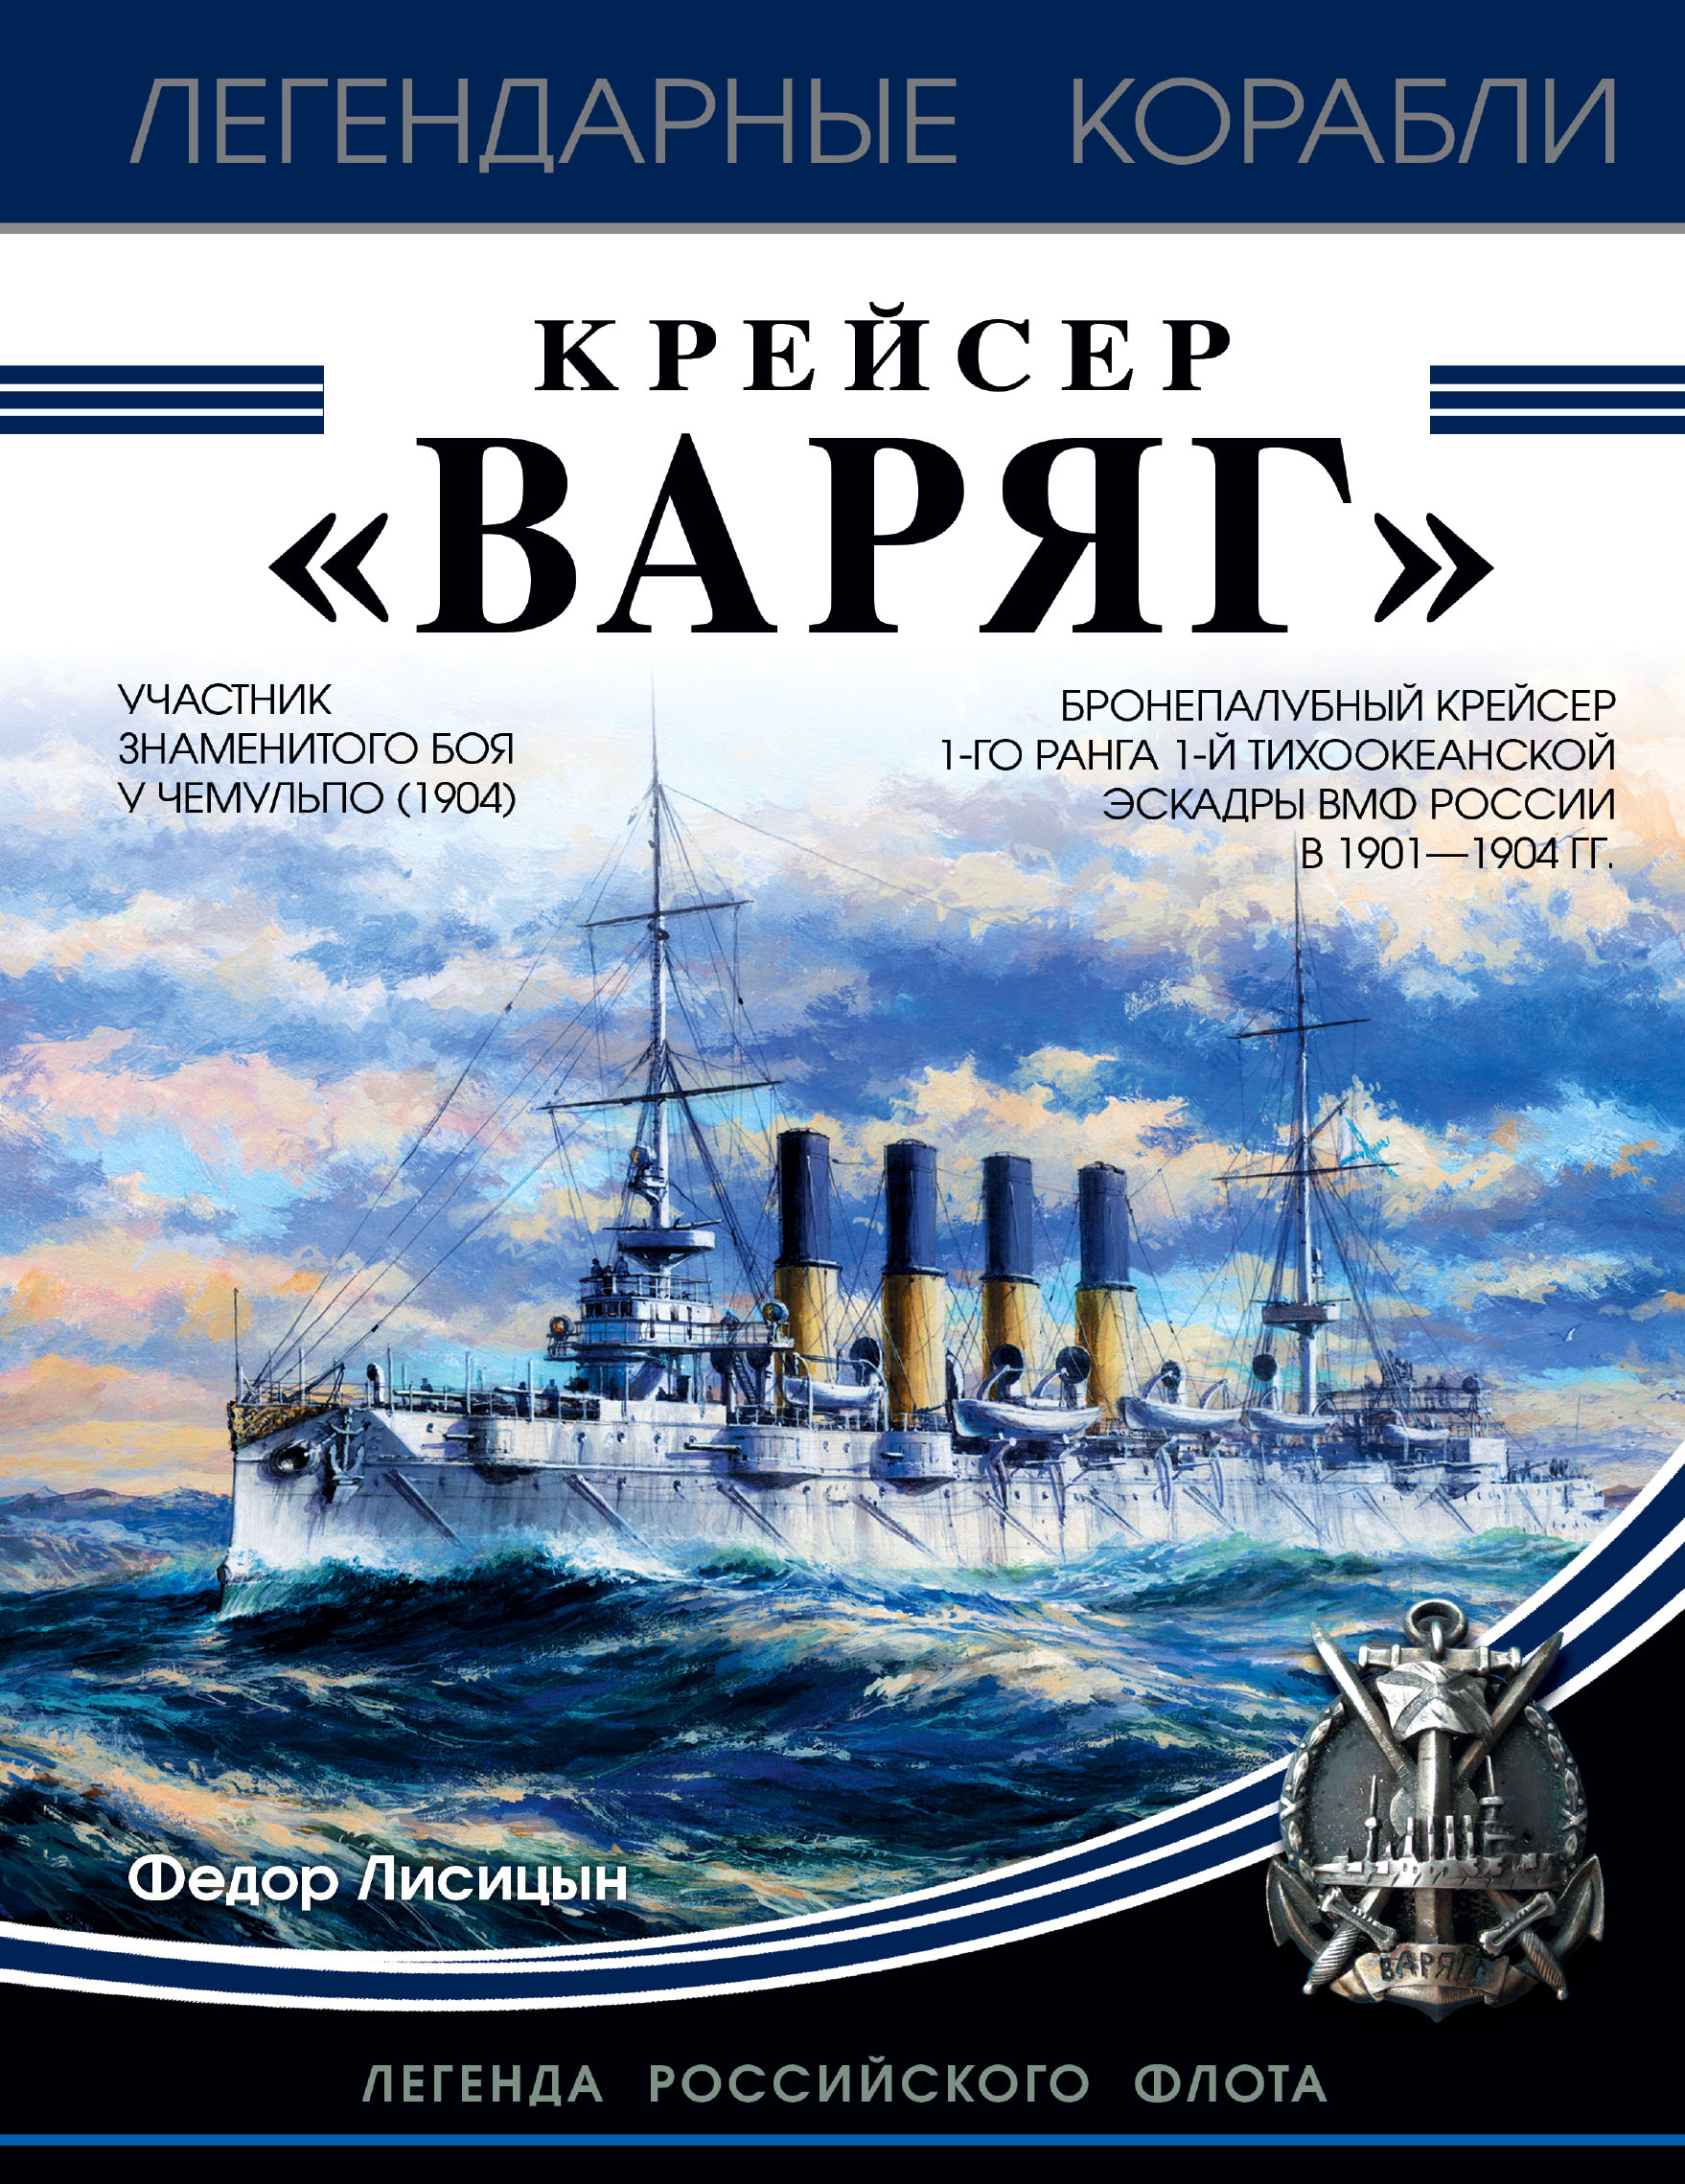 Лисицын Федор Викторович Крейсер Варяг чернов а одиссея крейсера варяг чемульпо владивосток